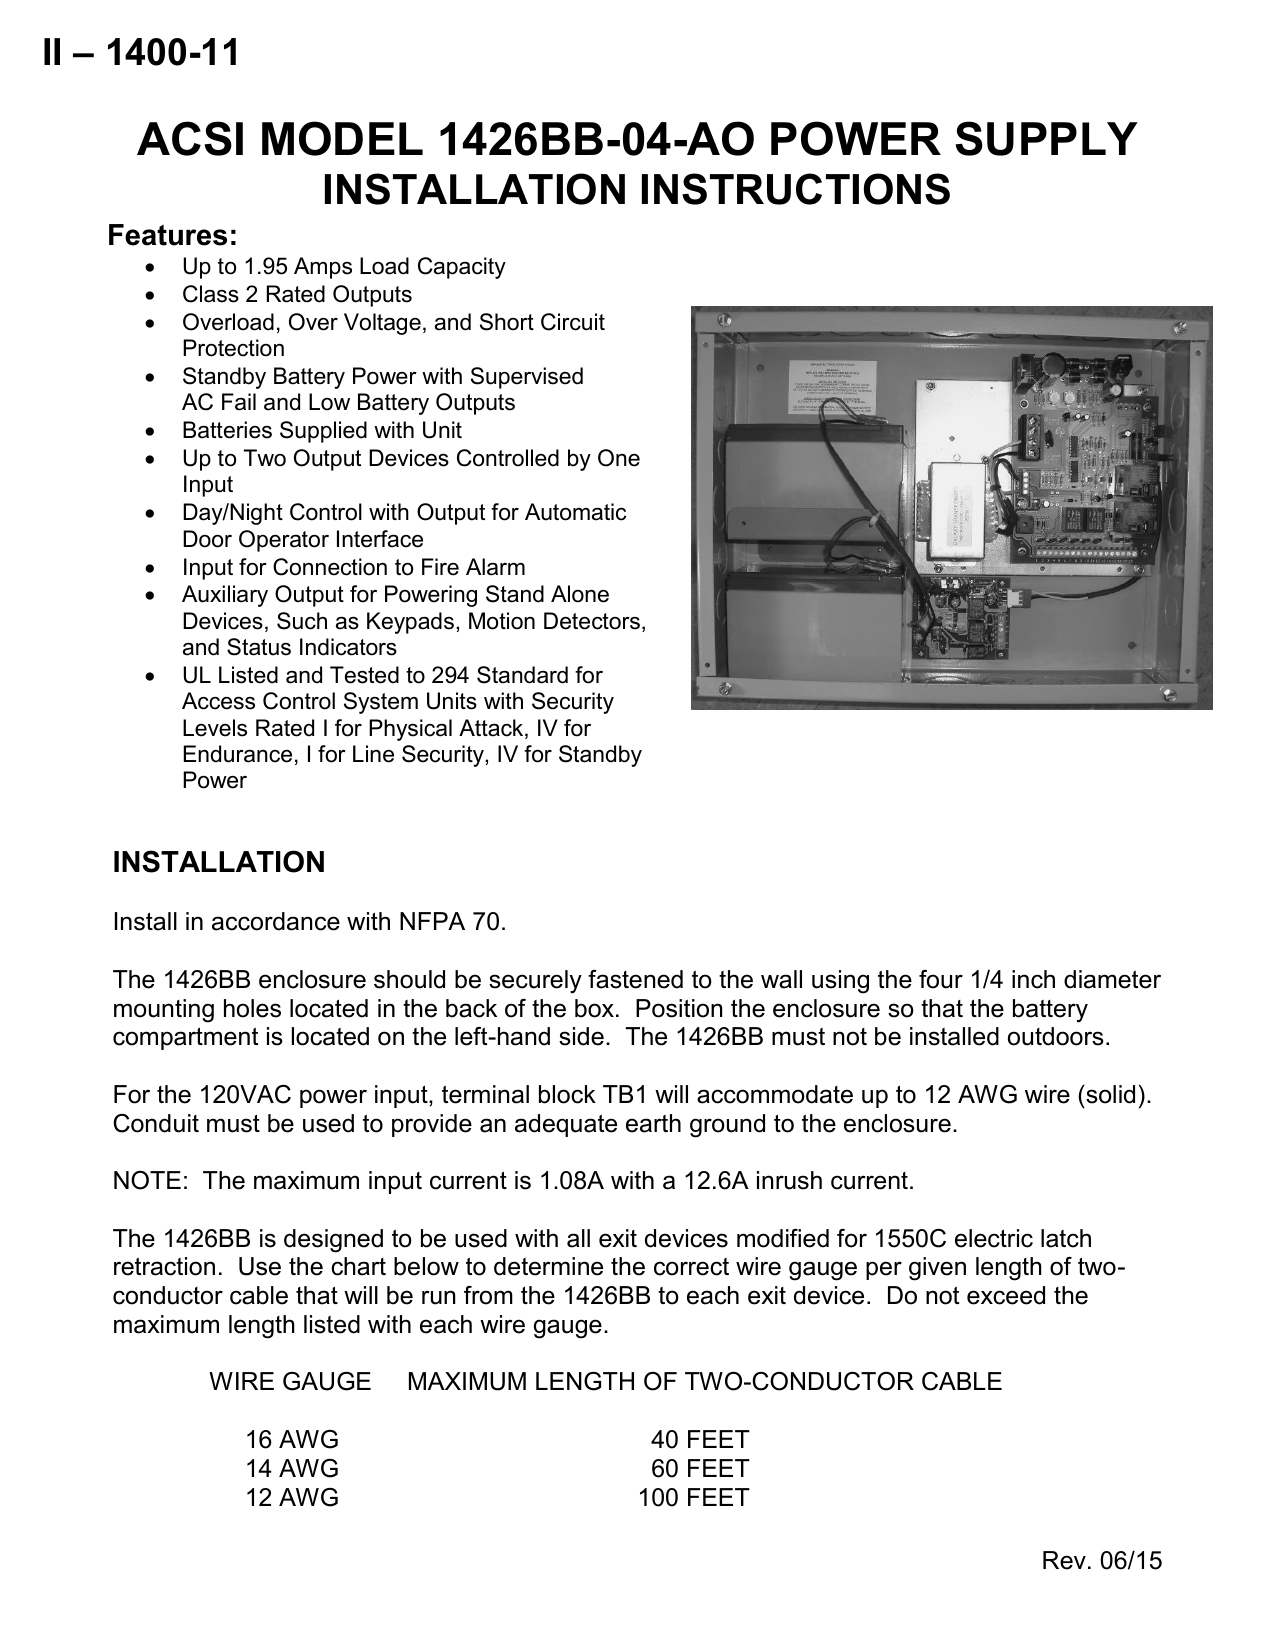 04 60 wiring diagram ro 4897  electric latch retraction wiring diagram schematic wiring  latch retraction wiring diagram